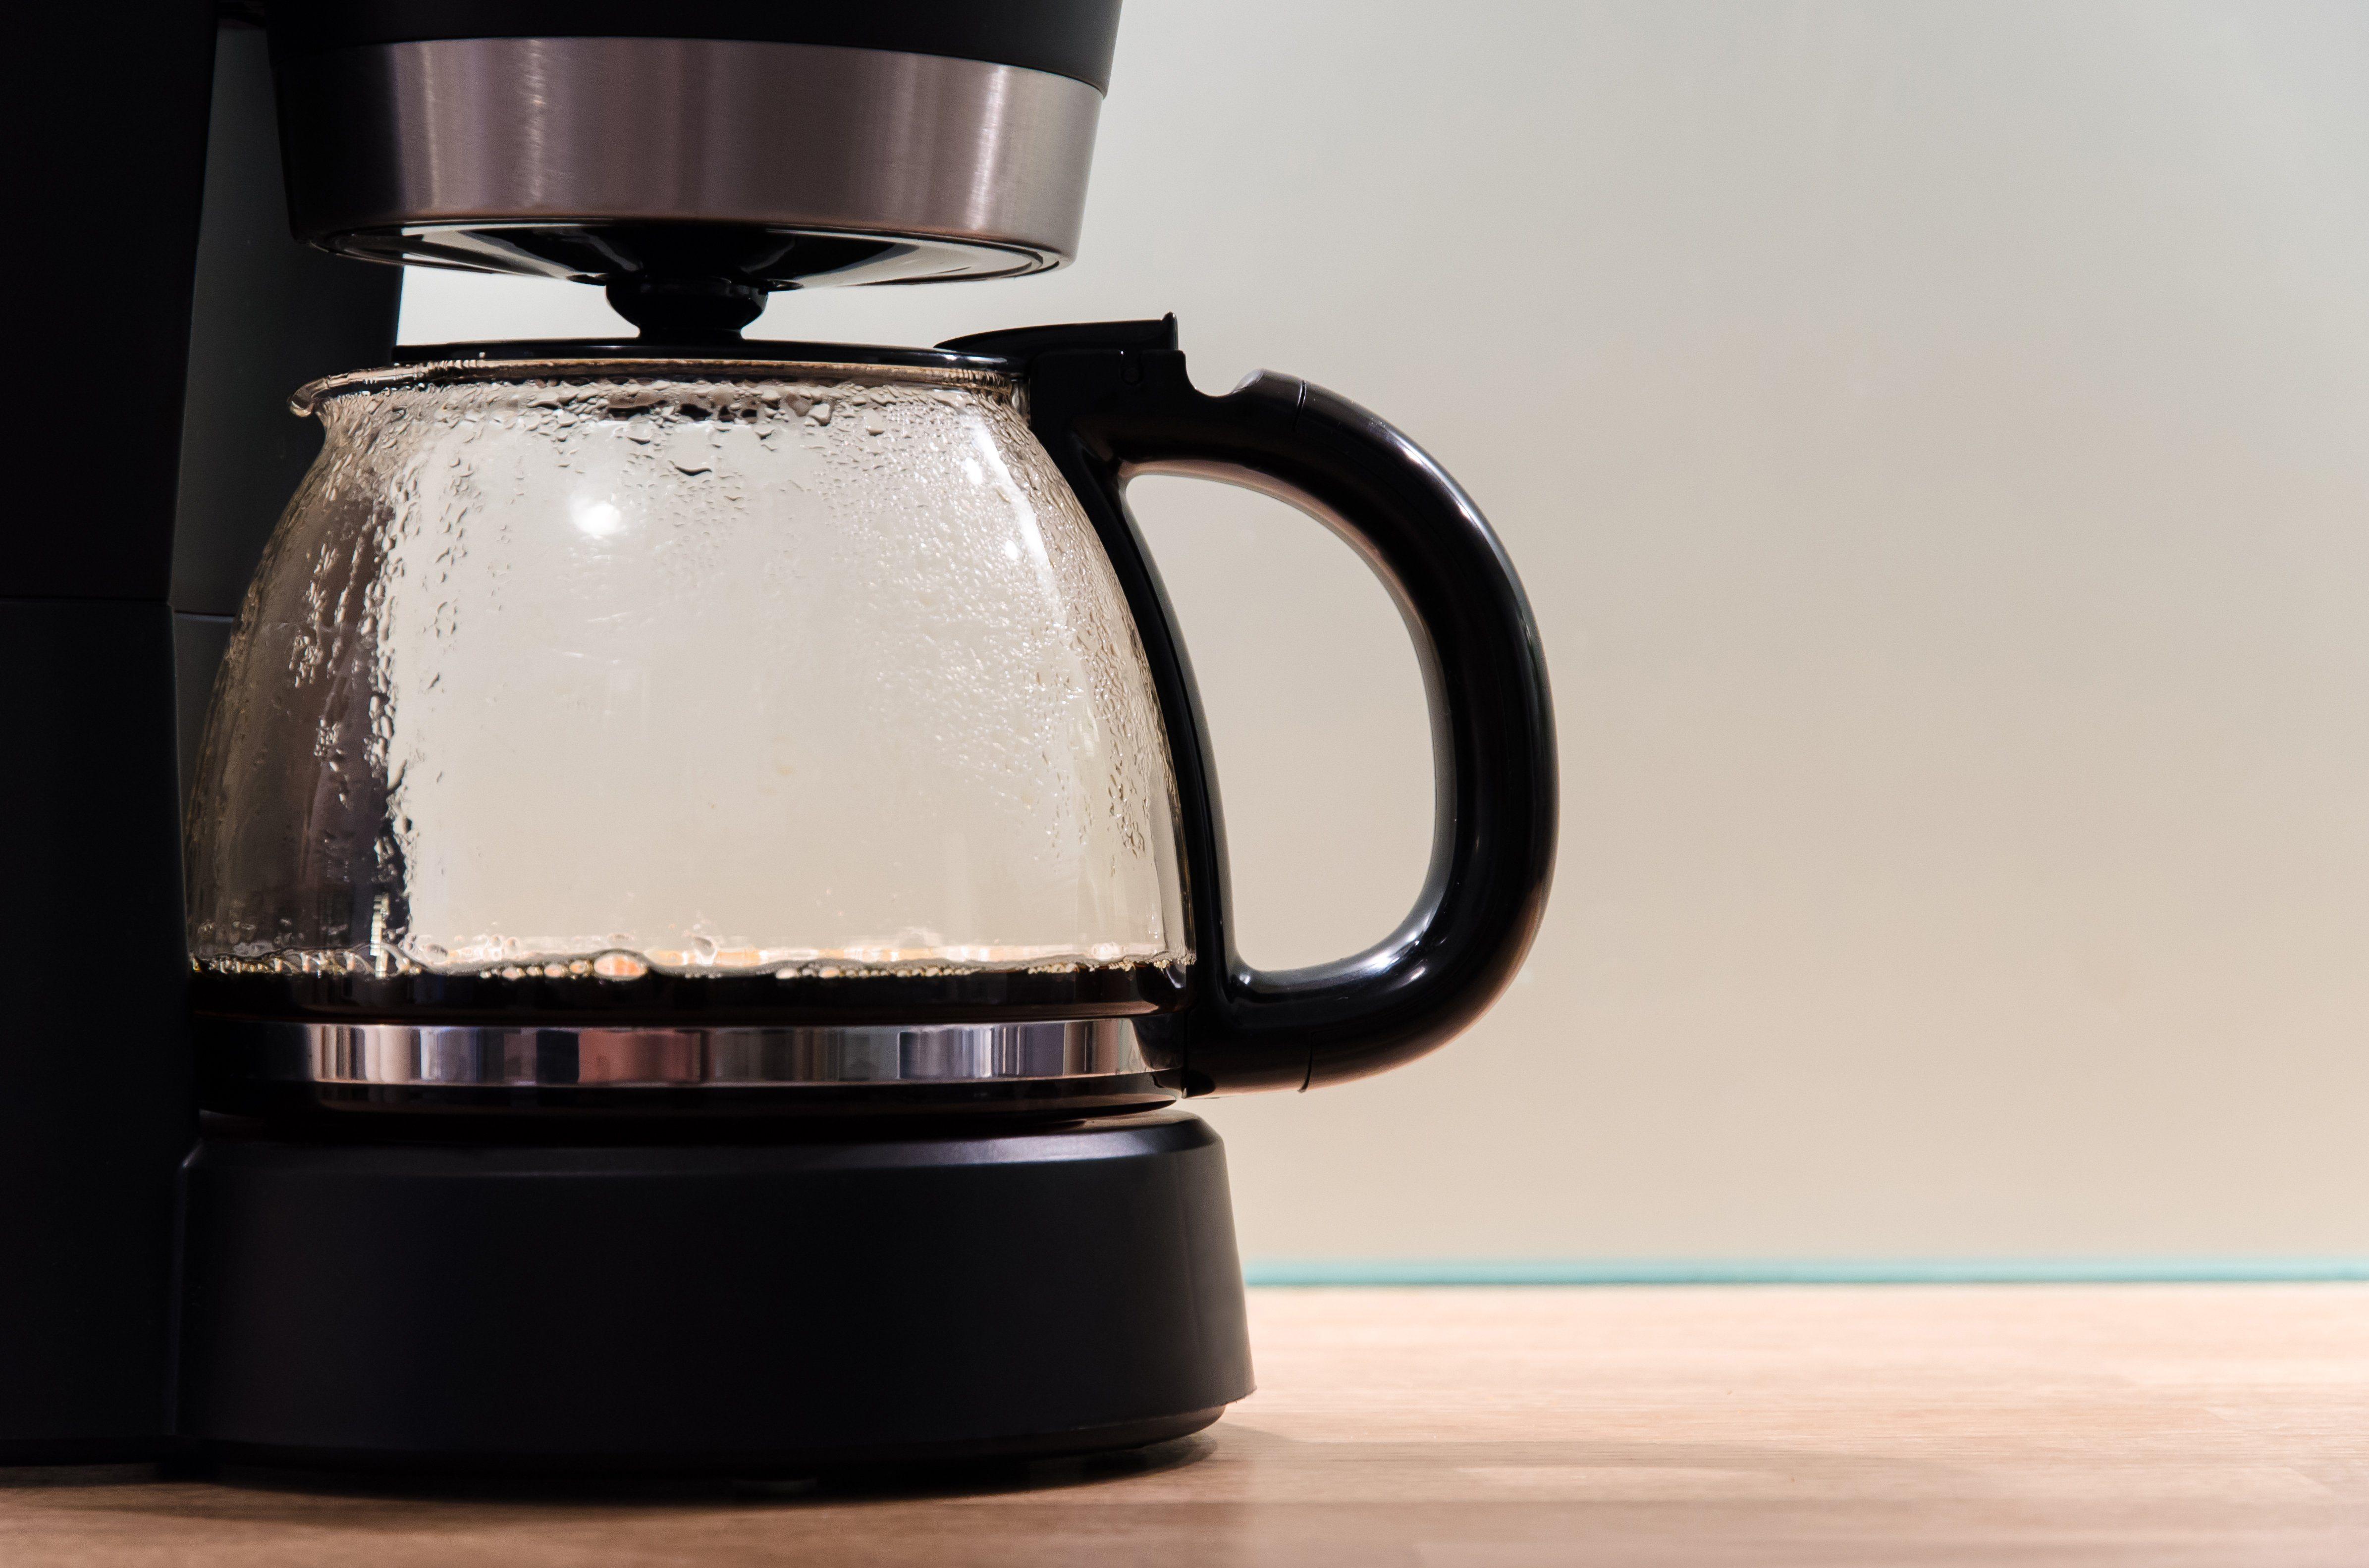 Close-up of coffeepot